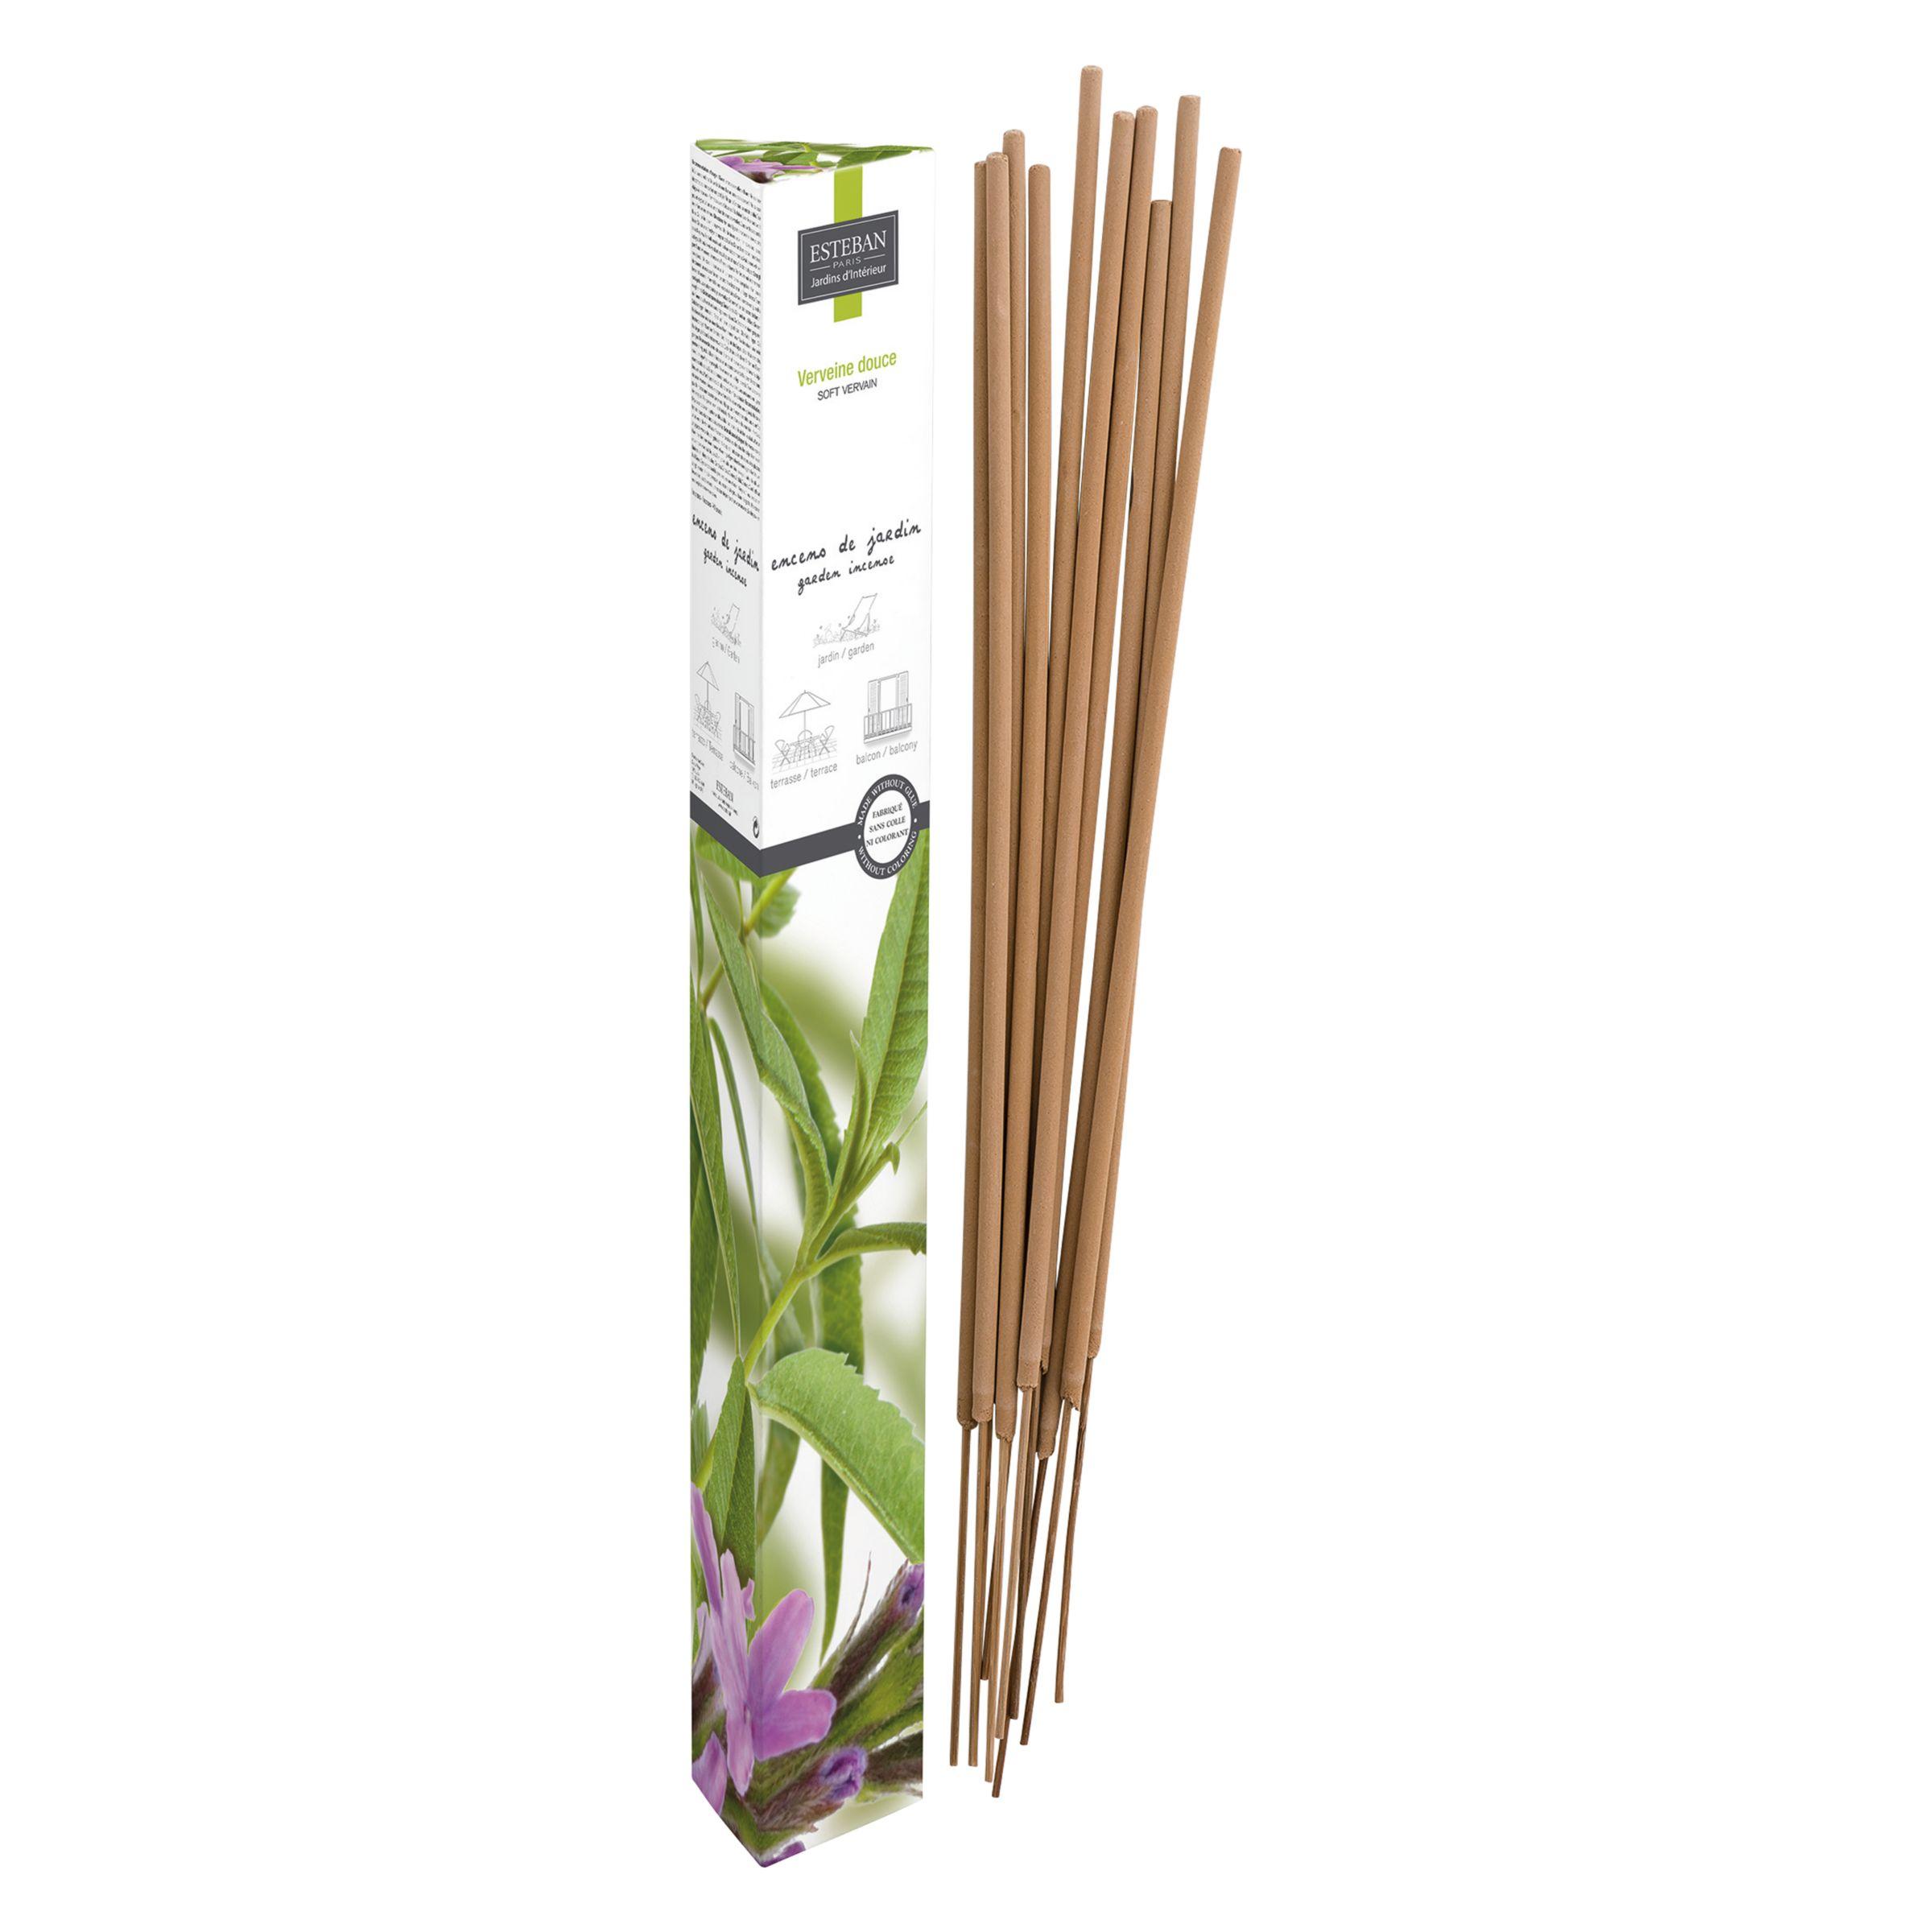 Esteban Esteban Garden Verveine Douce Incense Sticks